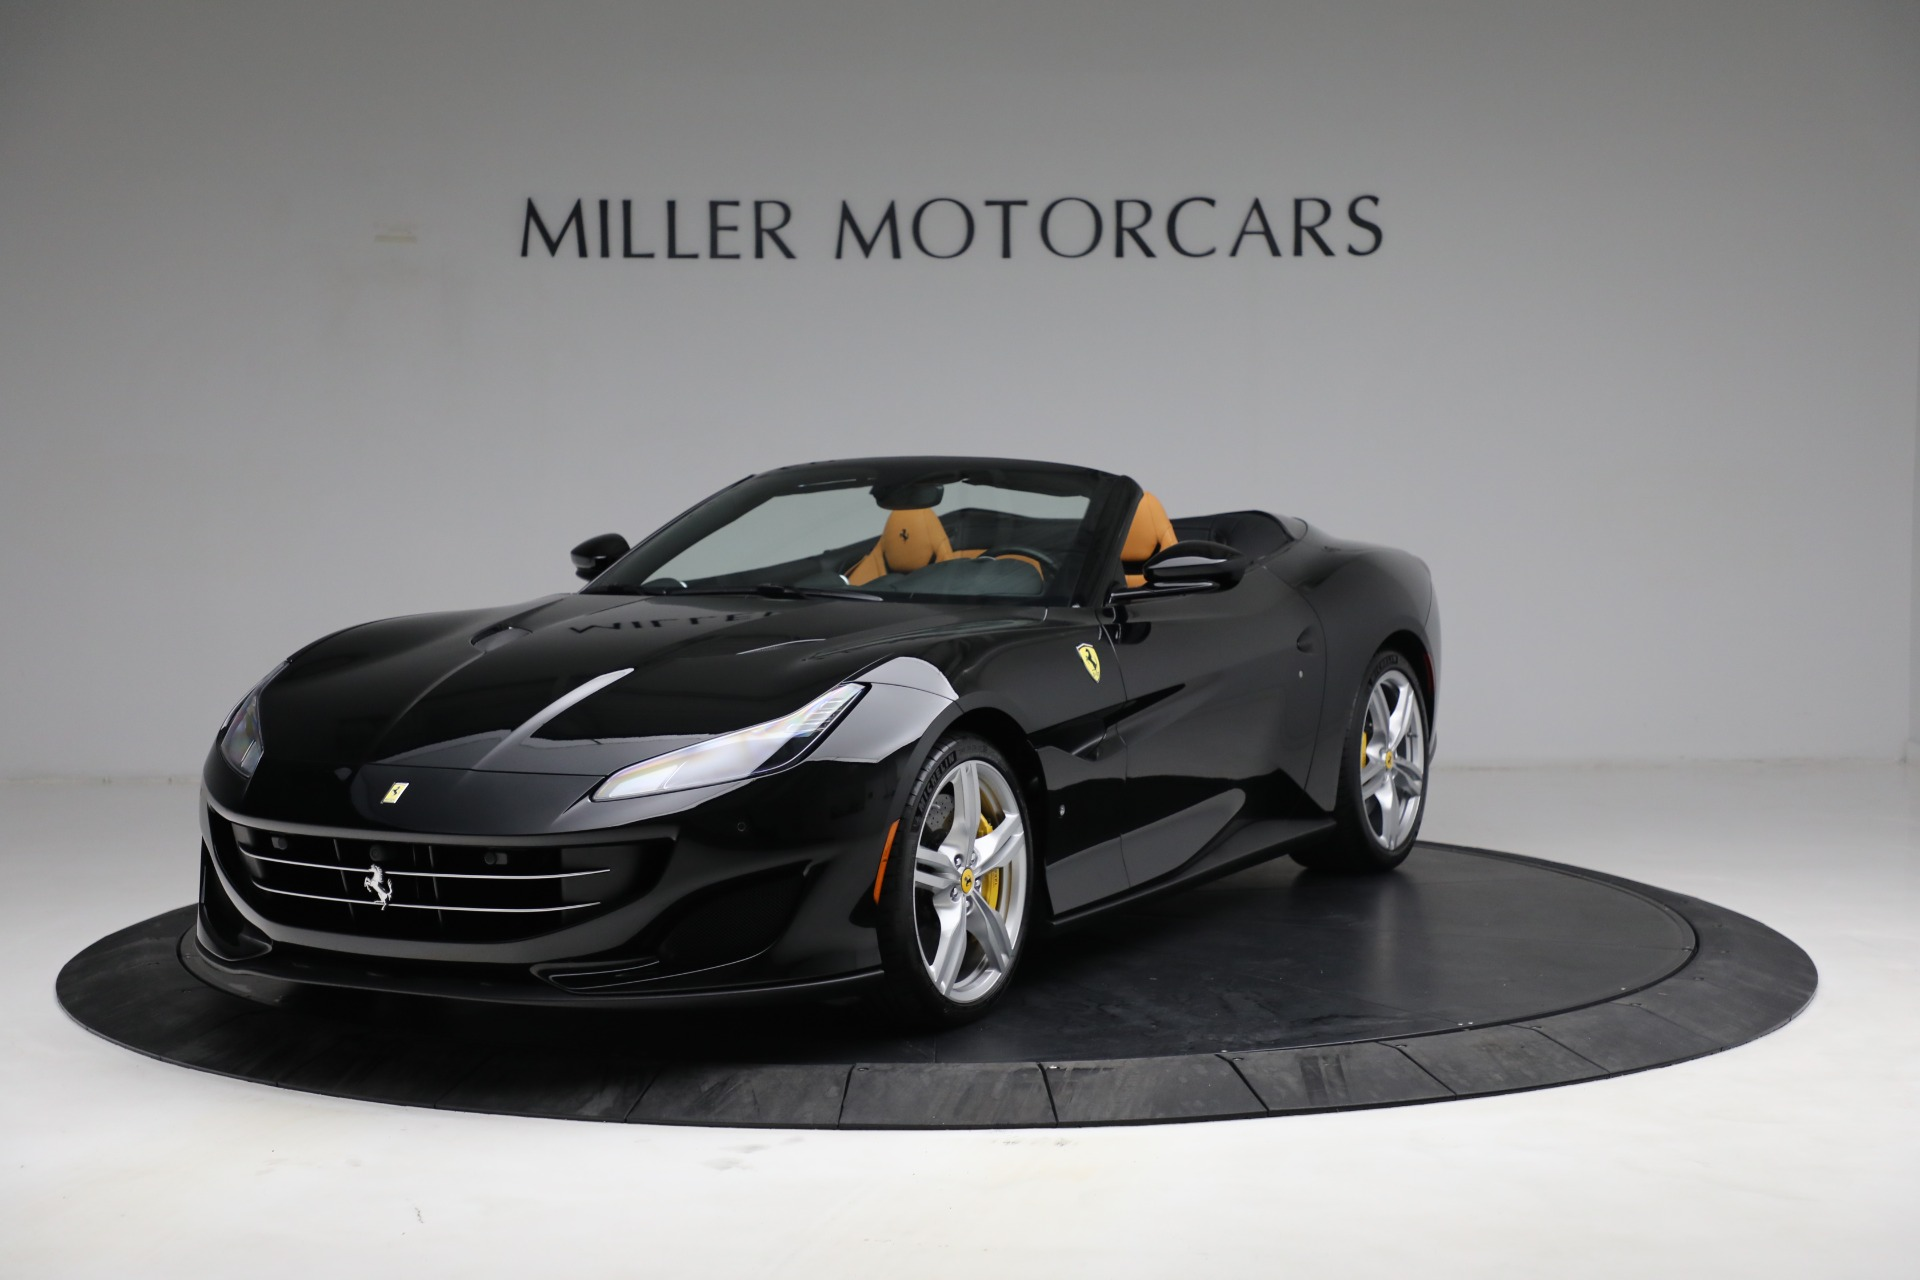 Used 2019 Ferrari Portofino for sale $231,900 at Rolls-Royce Motor Cars Greenwich in Greenwich CT 06830 1